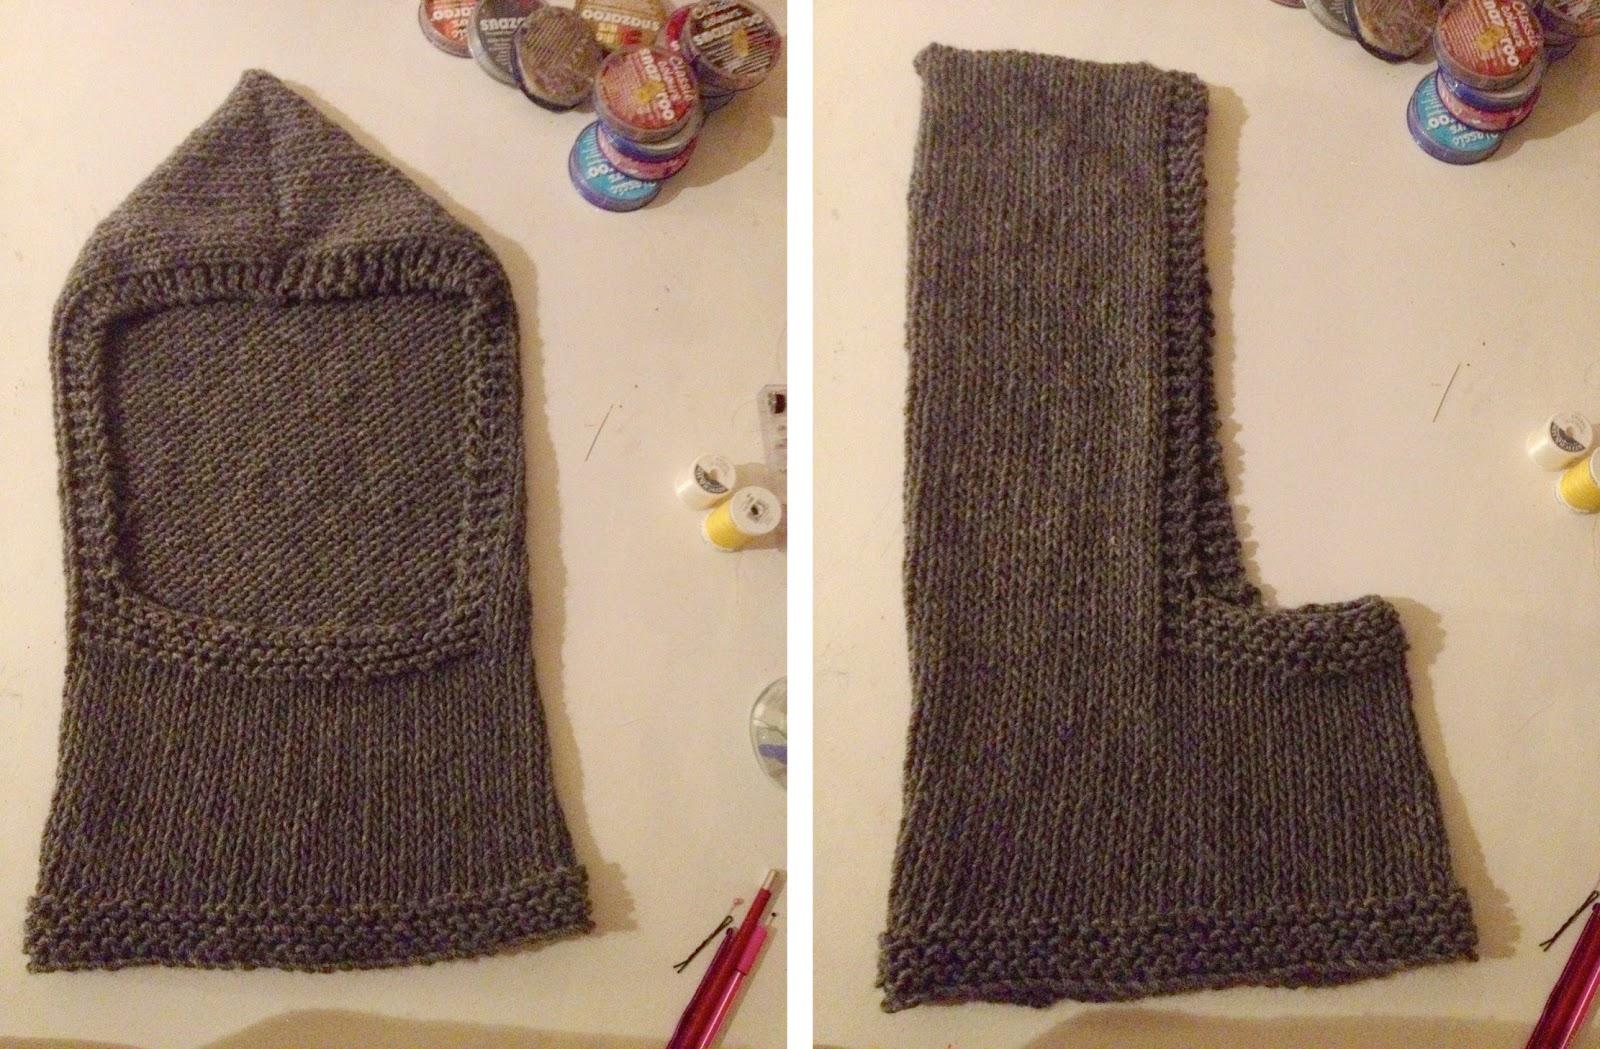 Chainmail Hood Knitting Pattern : Stitch me Softly...: The Hooded Simon - a knitting pattern